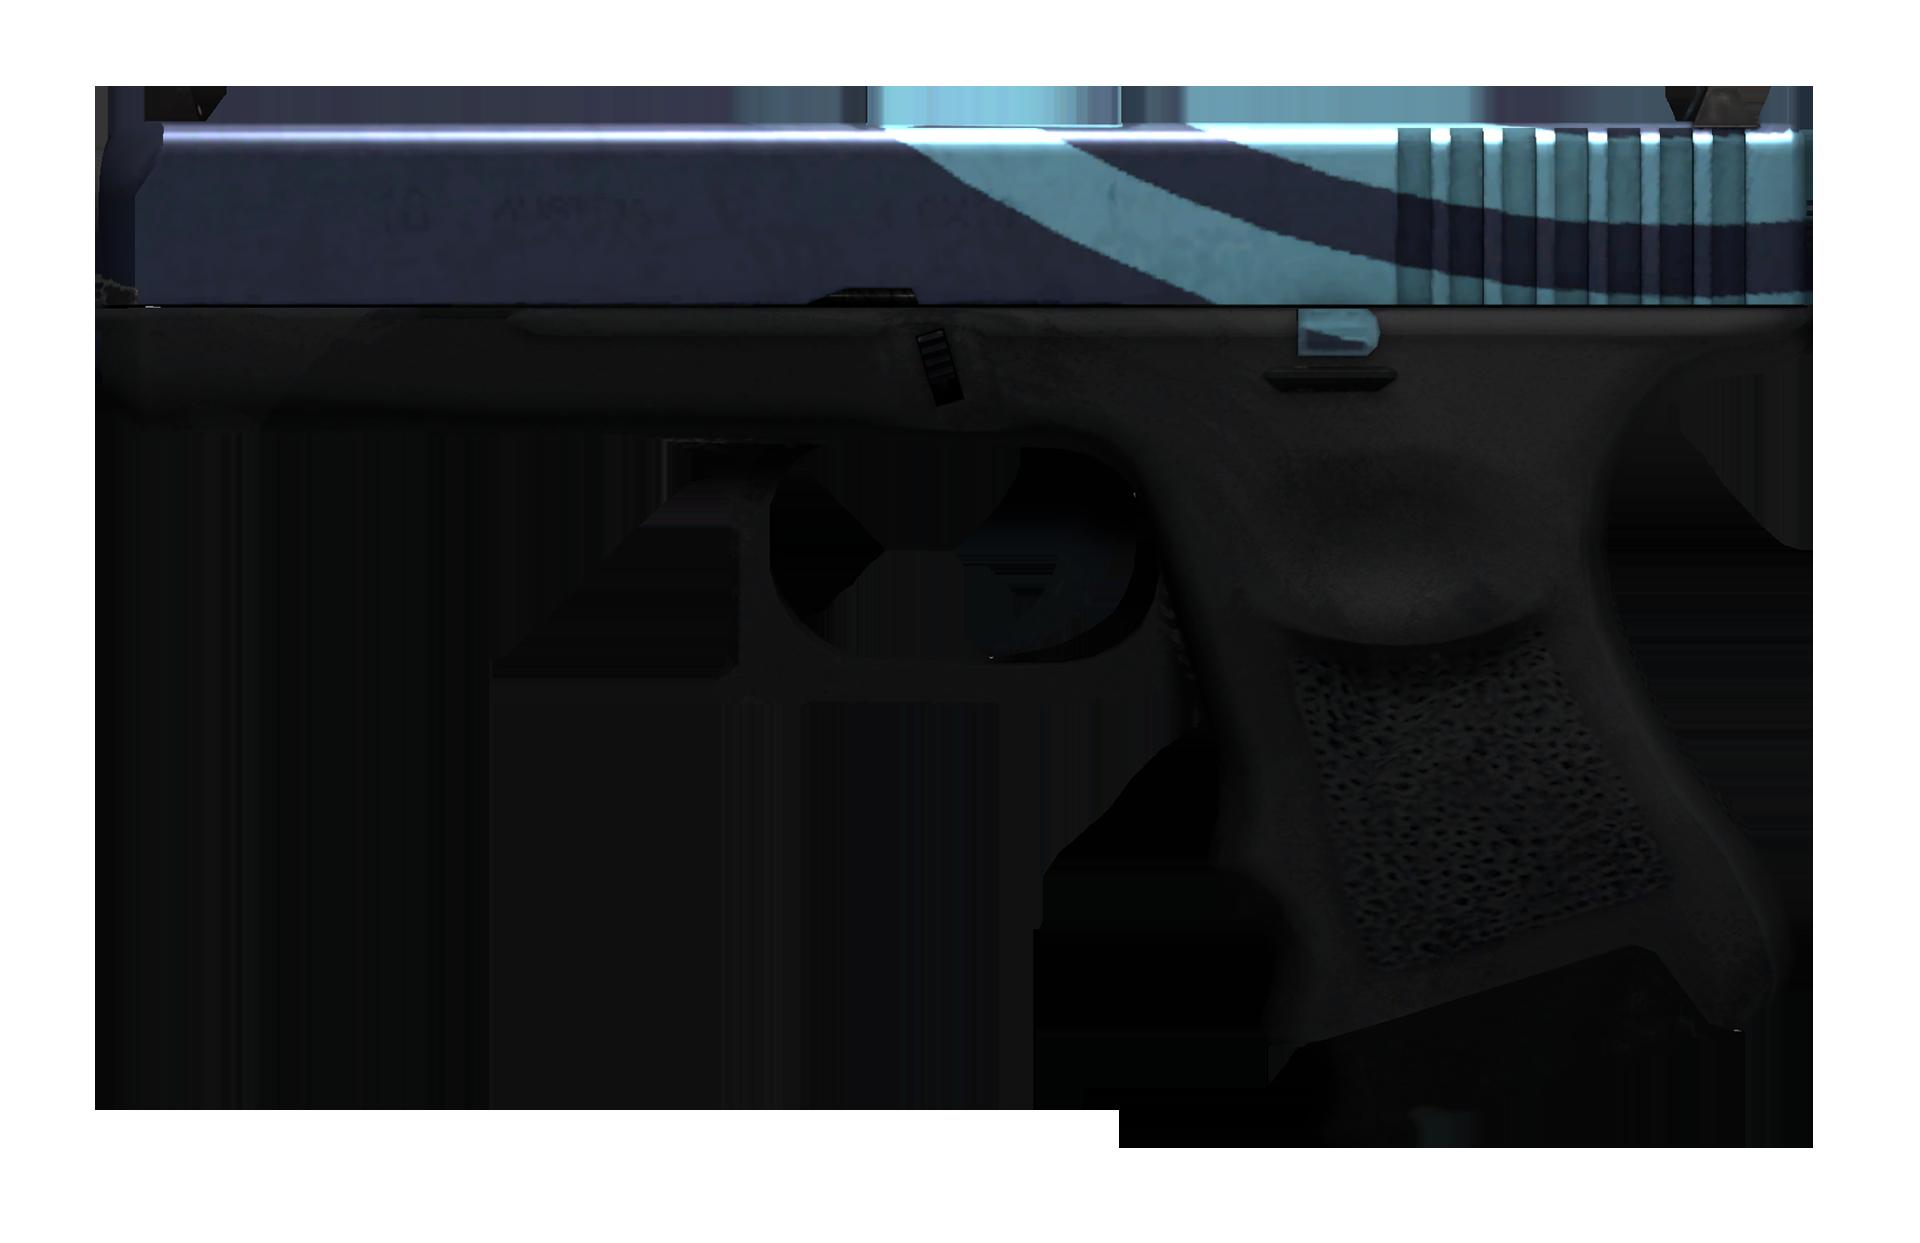 Glock-18 High Beam Large Rendering